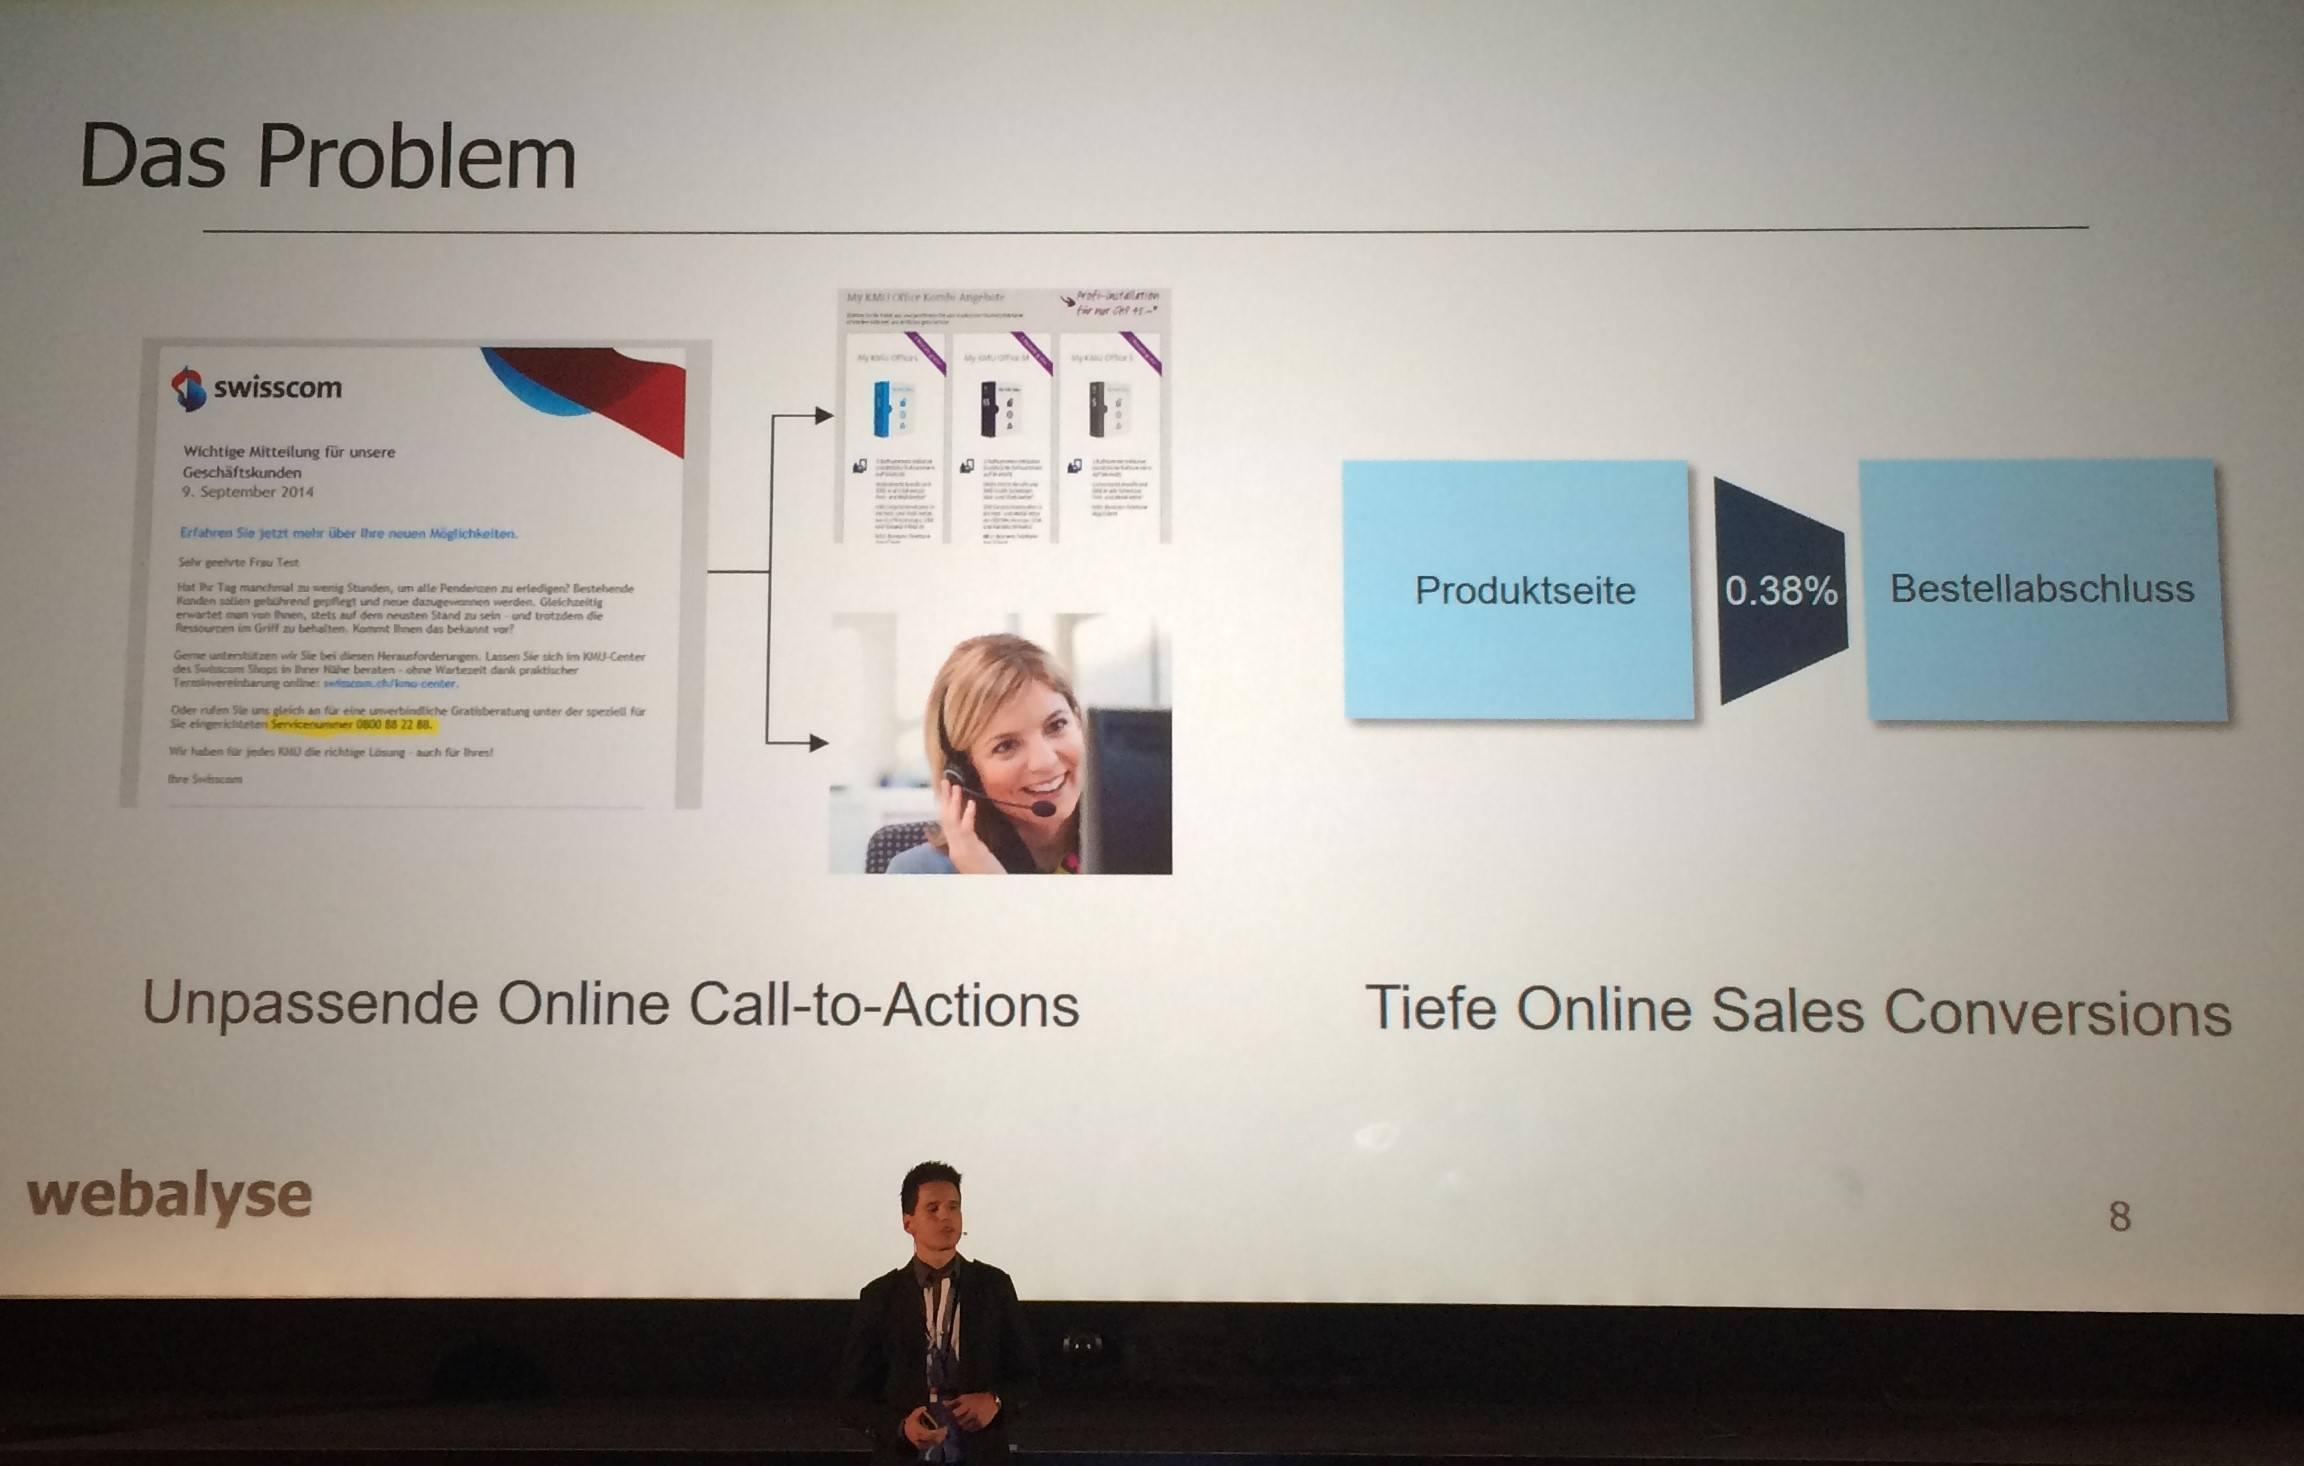 Unpassende Online Call-to-Actions bieten schwache Konversionsraten